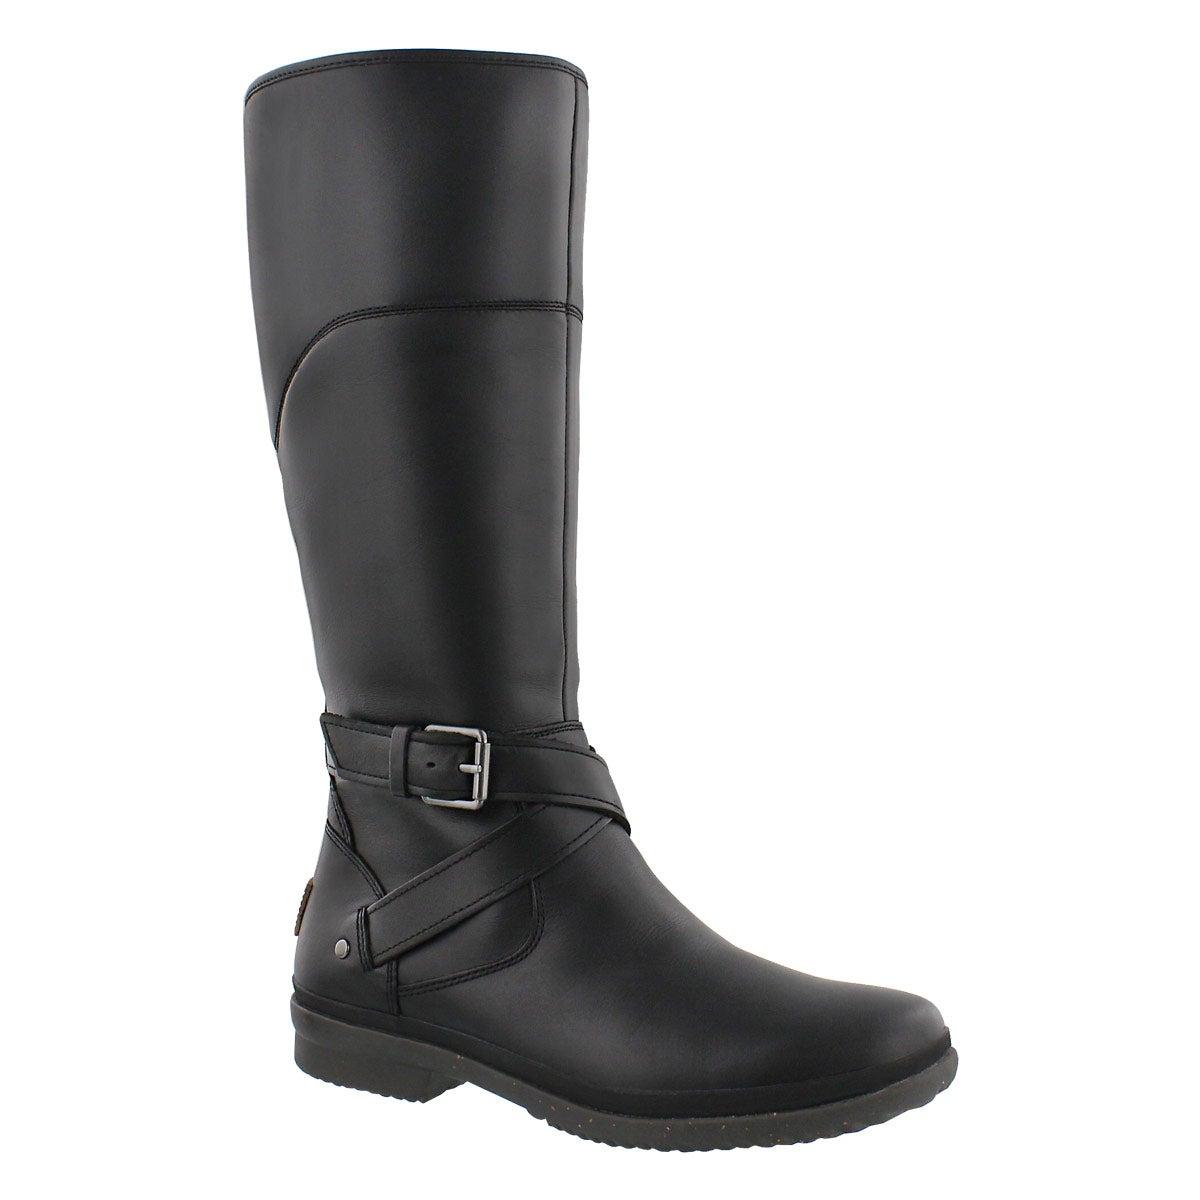 Women's EVANNA black waterproof riding boots